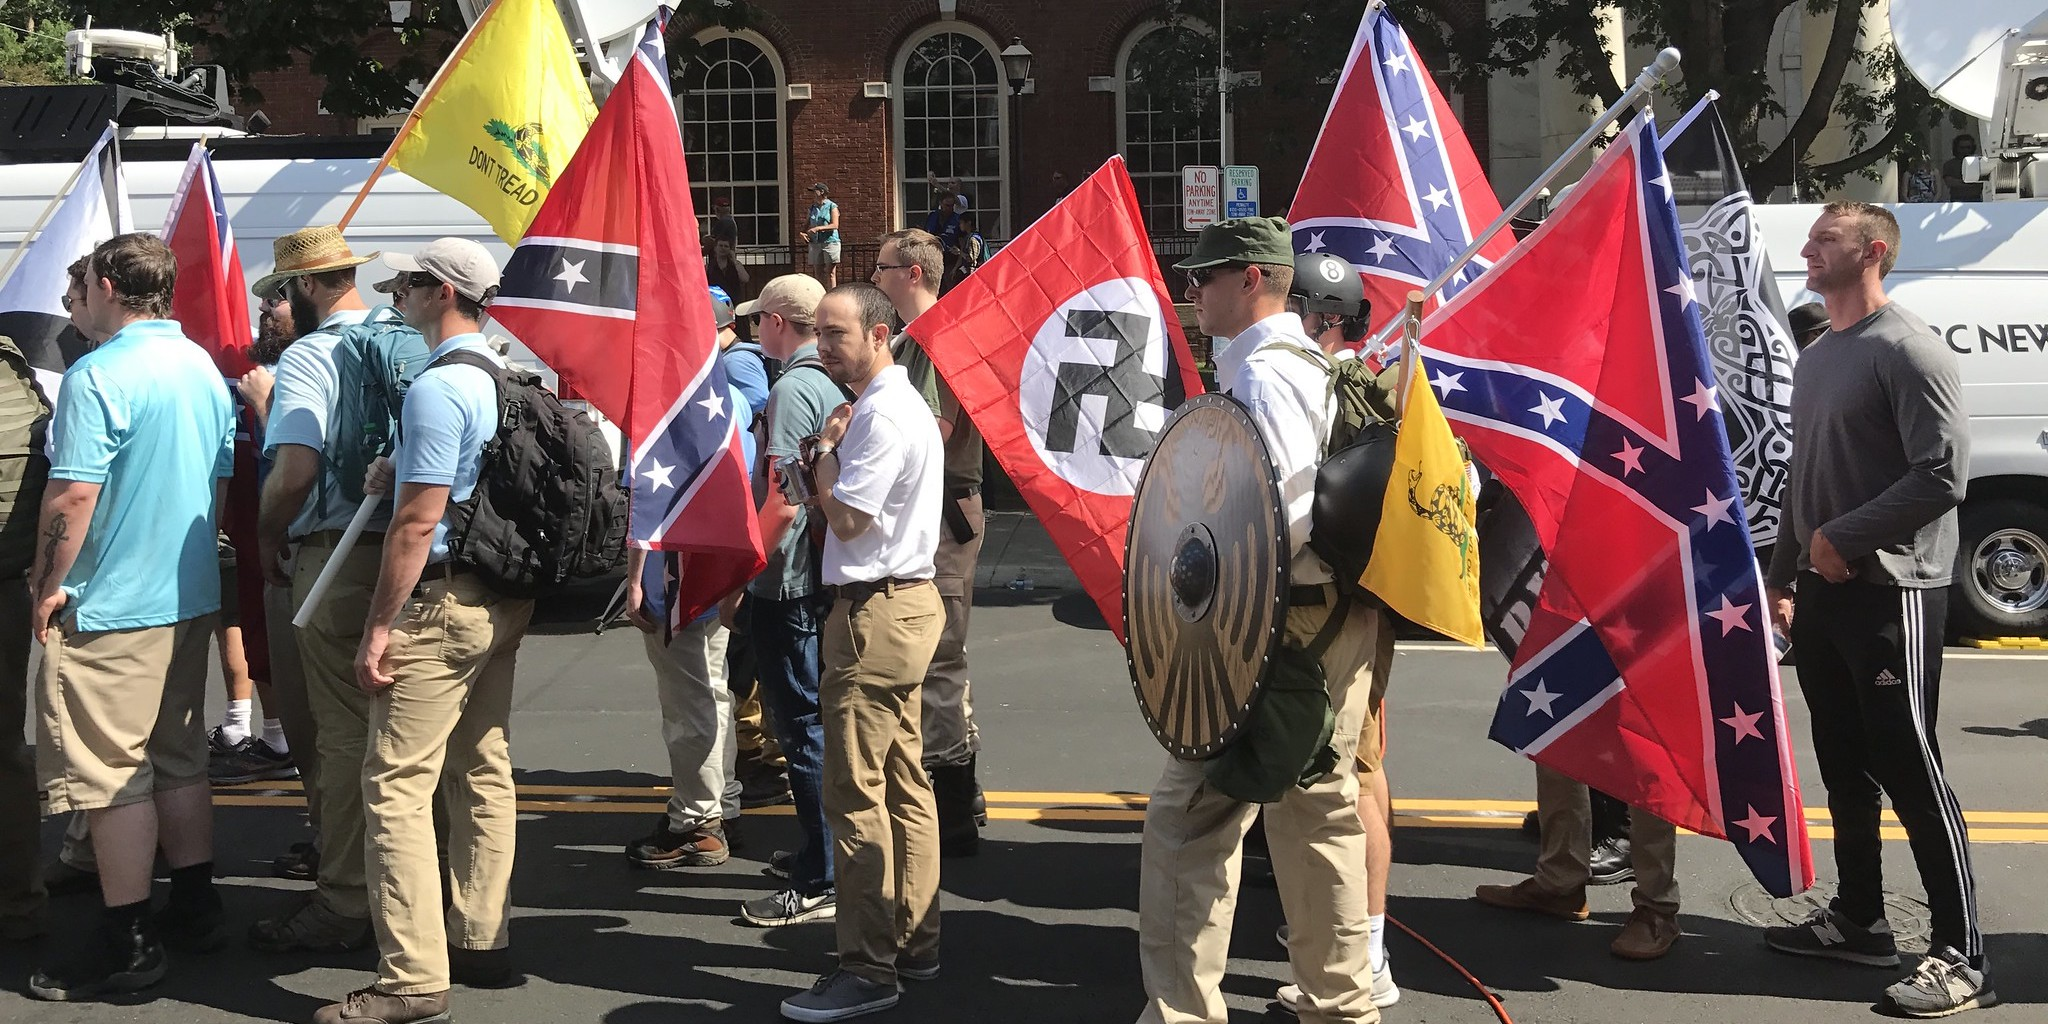 Charlottesville Rally Nazis, Photo Credit: Anthony.Crider